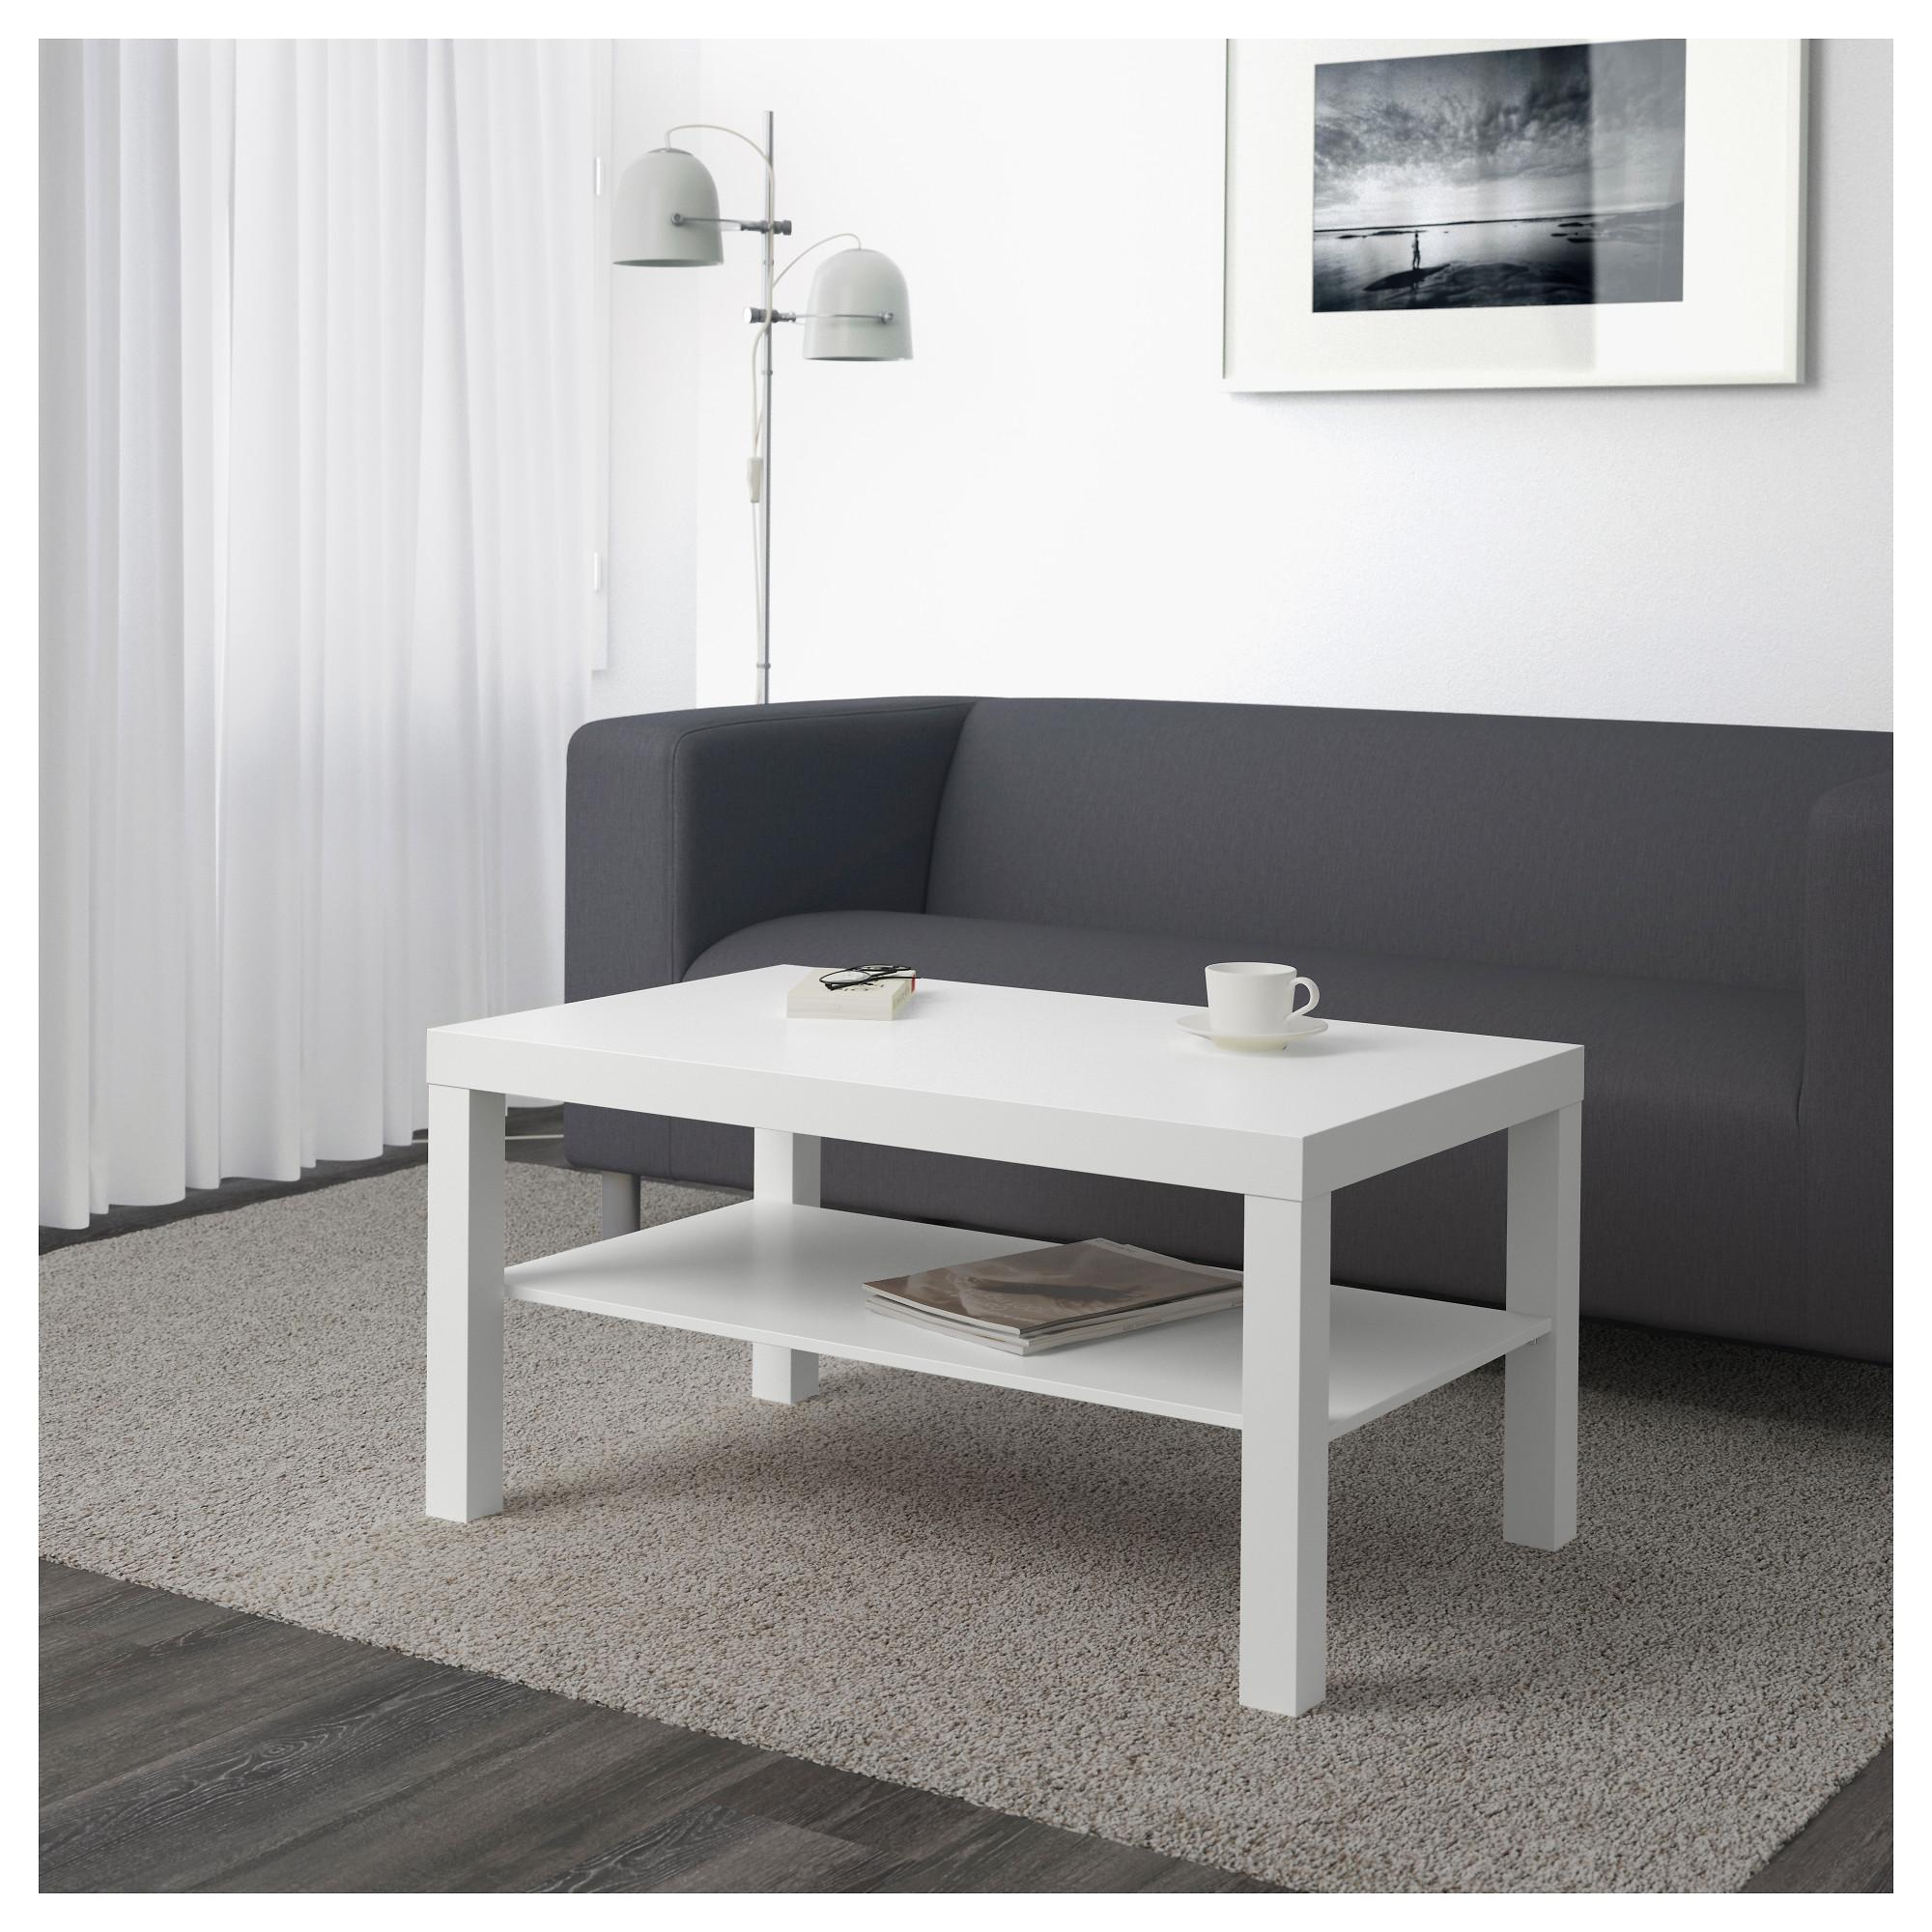 Table Basse Salon Ikea.Ikea Lithuania Shop For Furniture Lighting Home